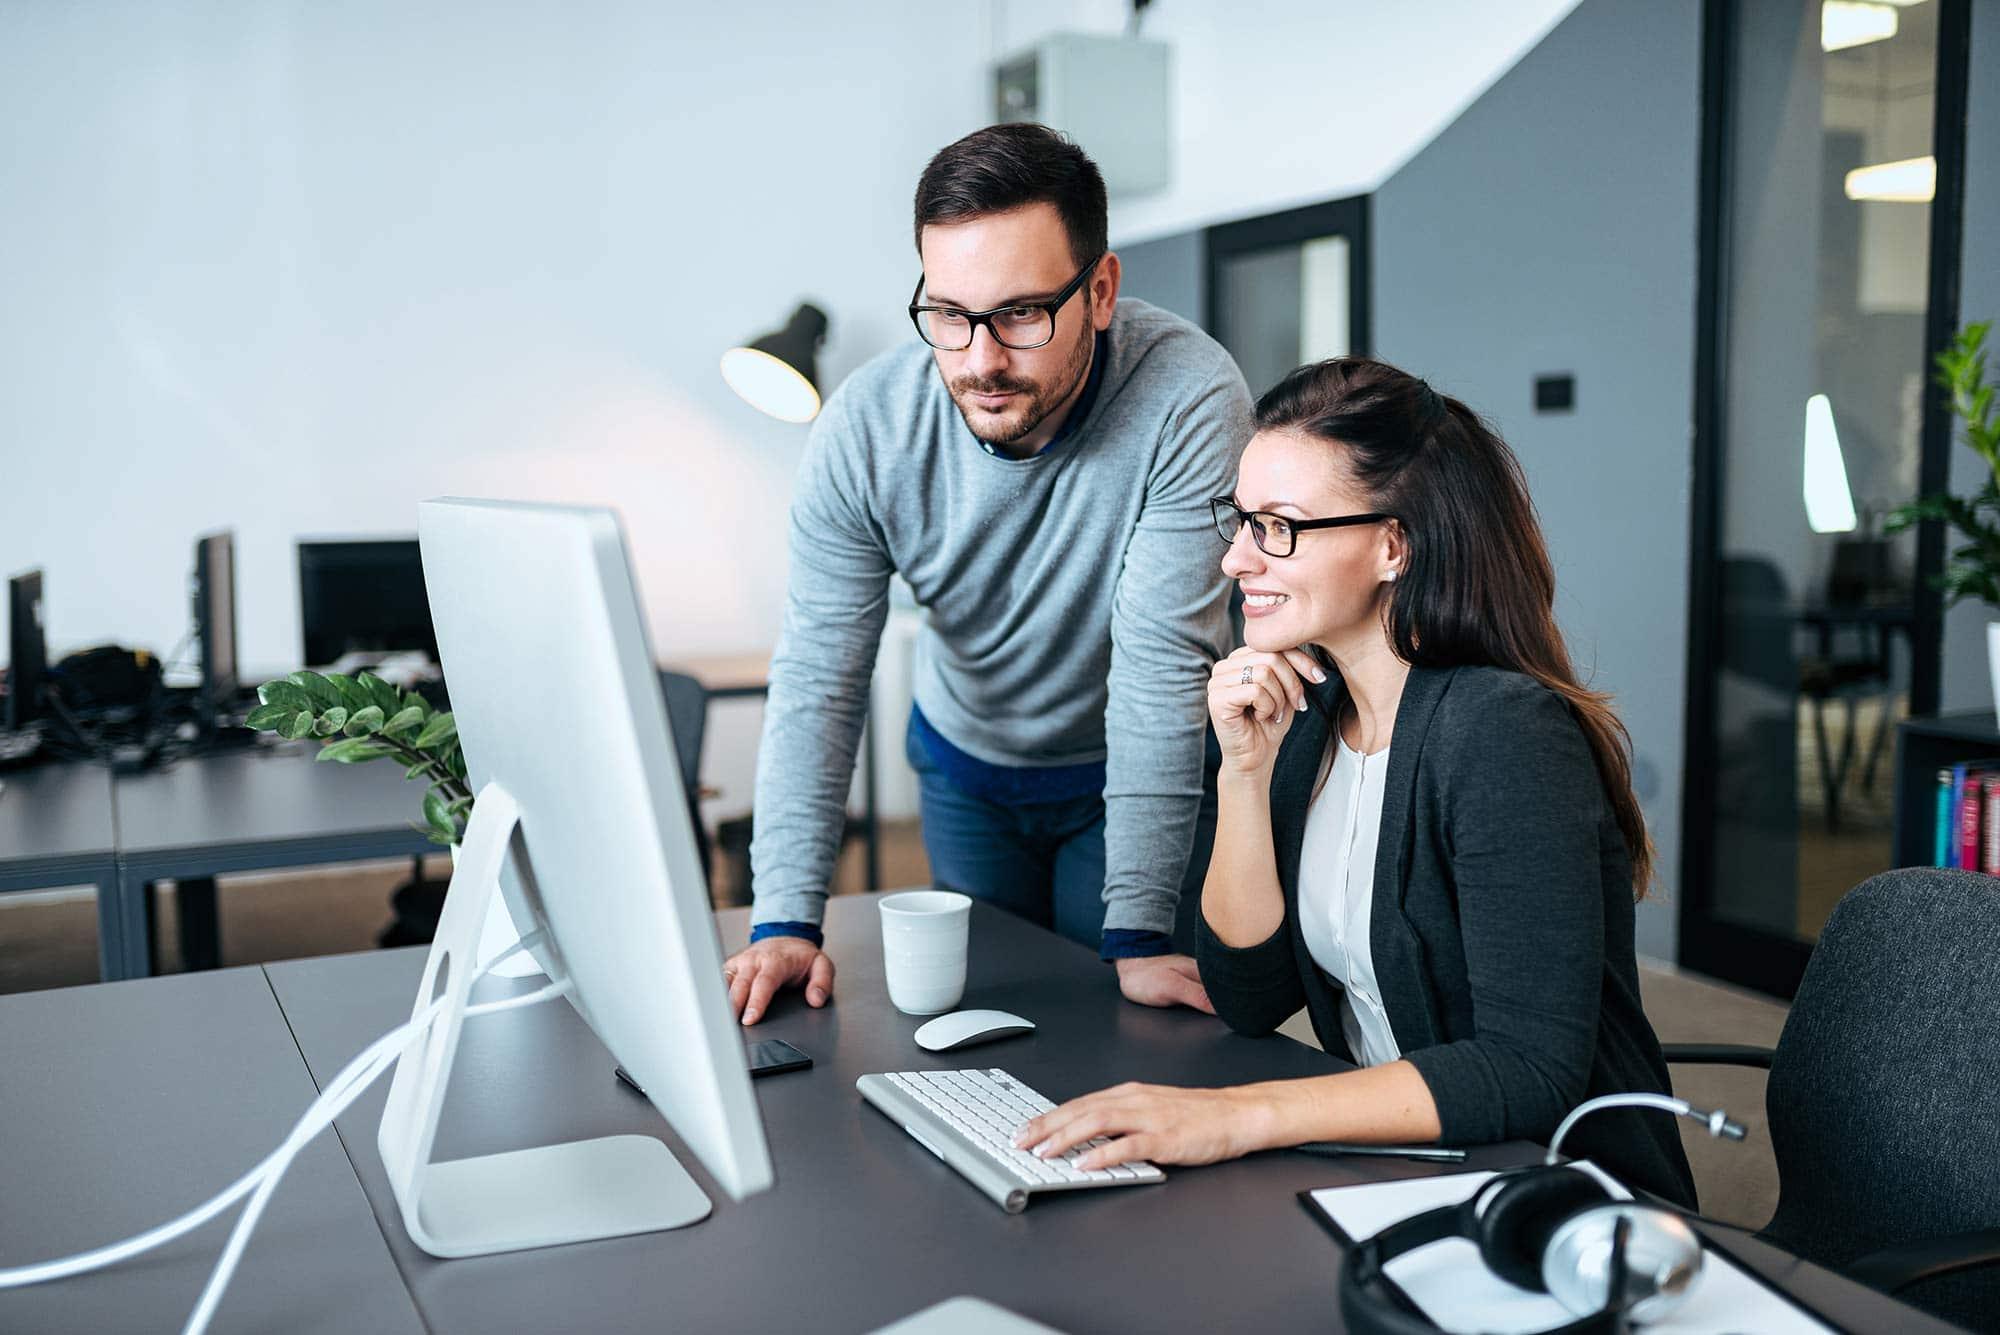 Man looking at computer monitor next to women